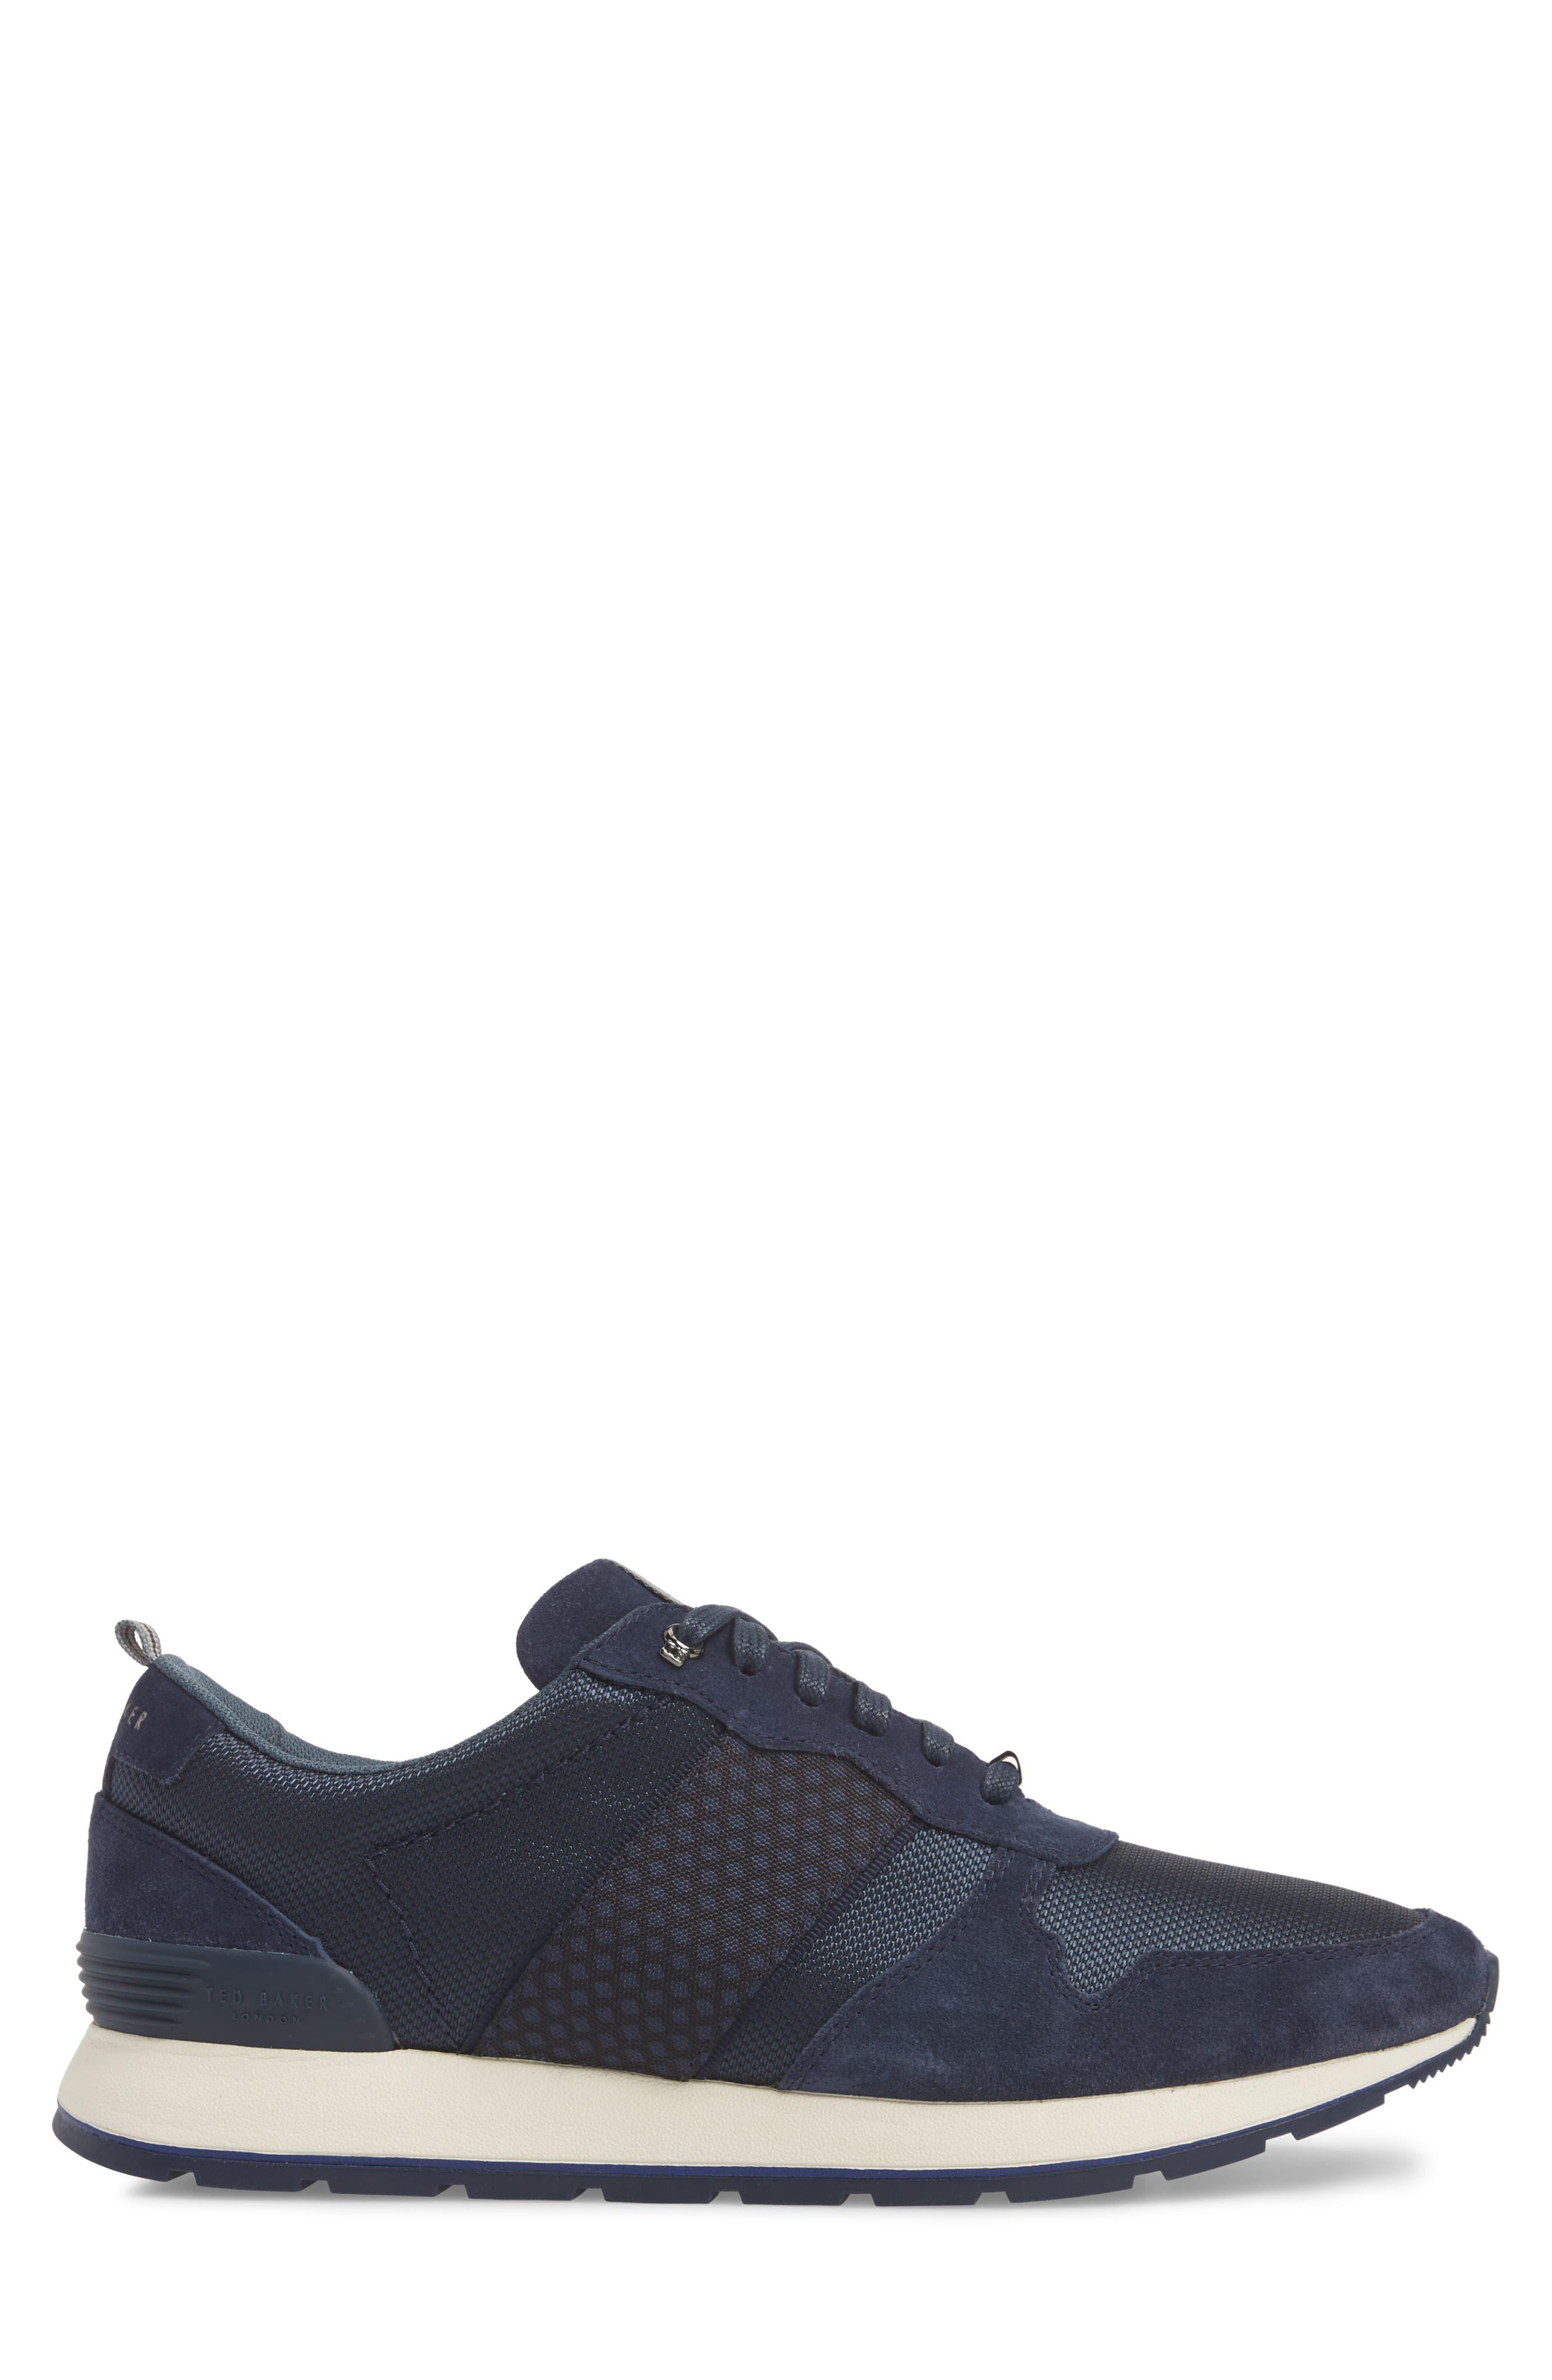 Hebey Lace-Up Sneaker,                             Alternate thumbnail 3, color,                             DARK BLUE TEXTILE